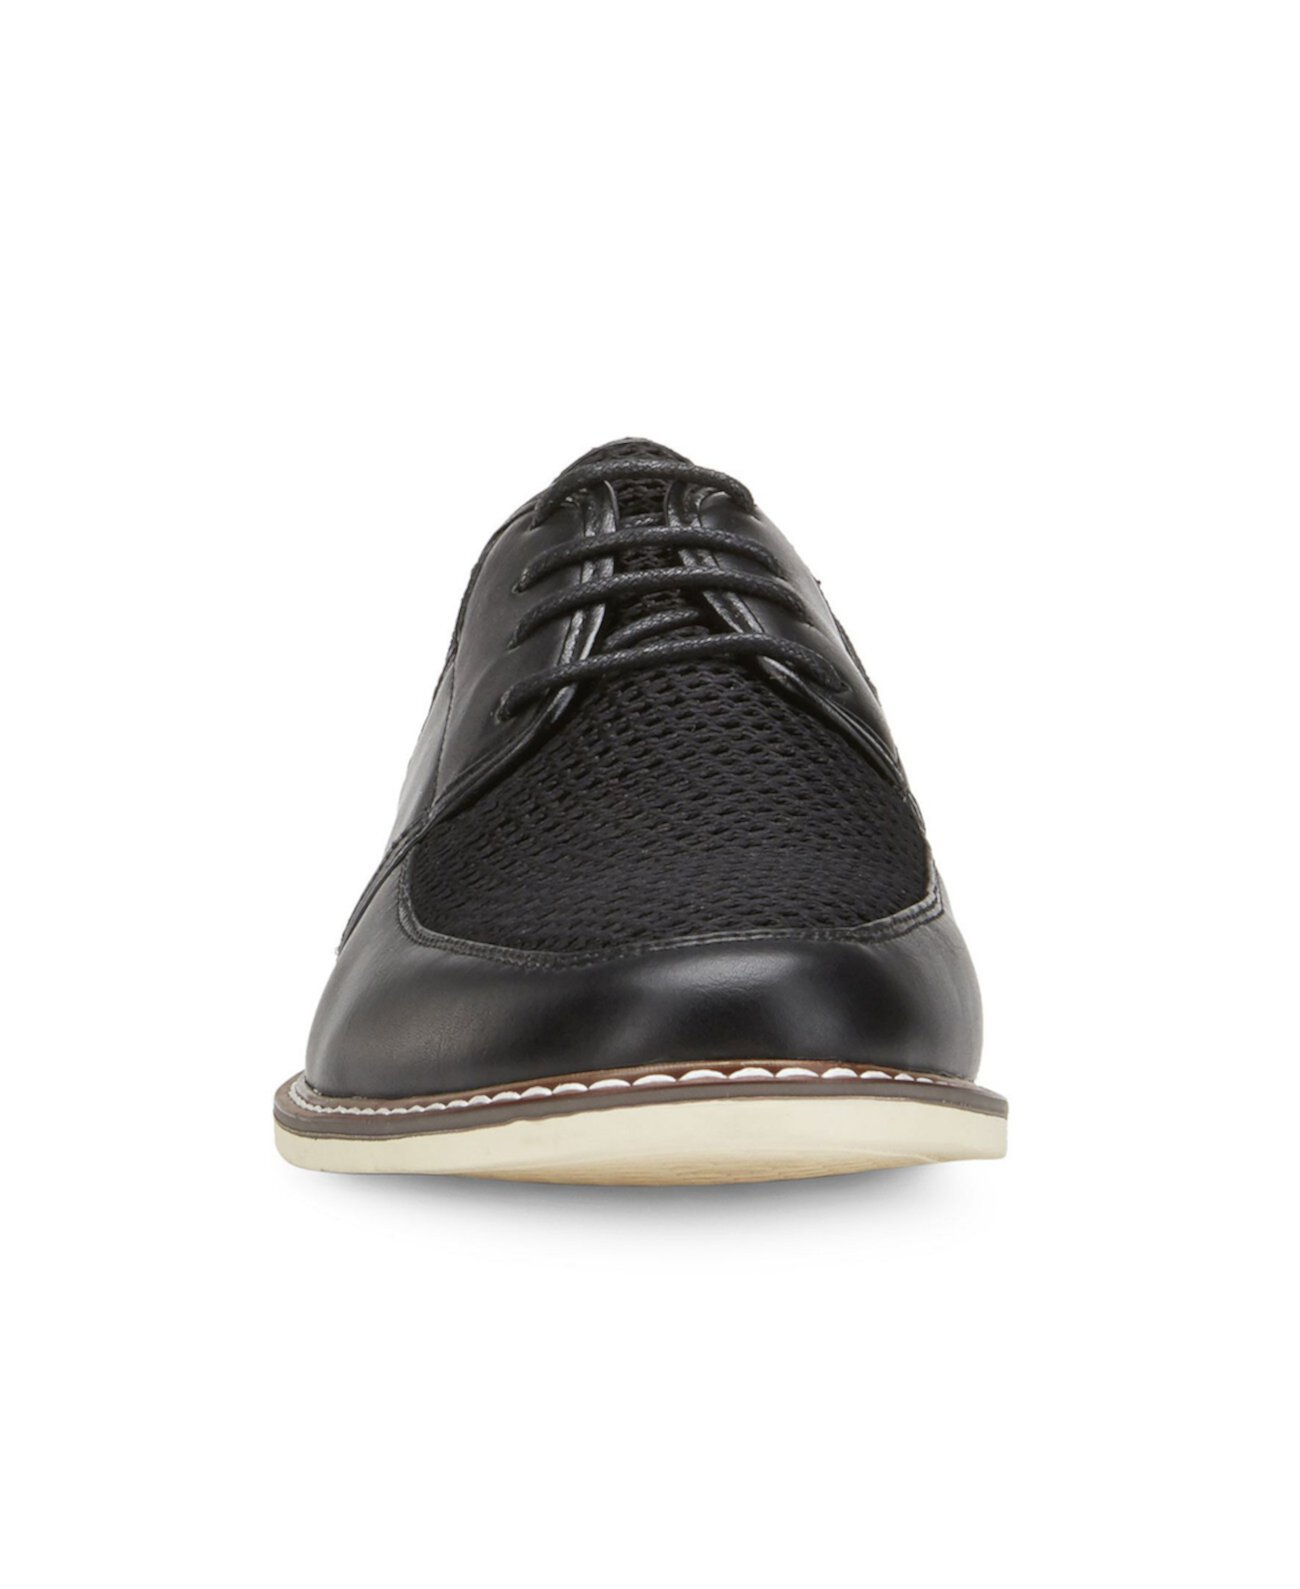 Мужская одежда The Lawson Shoe Derby XRAY